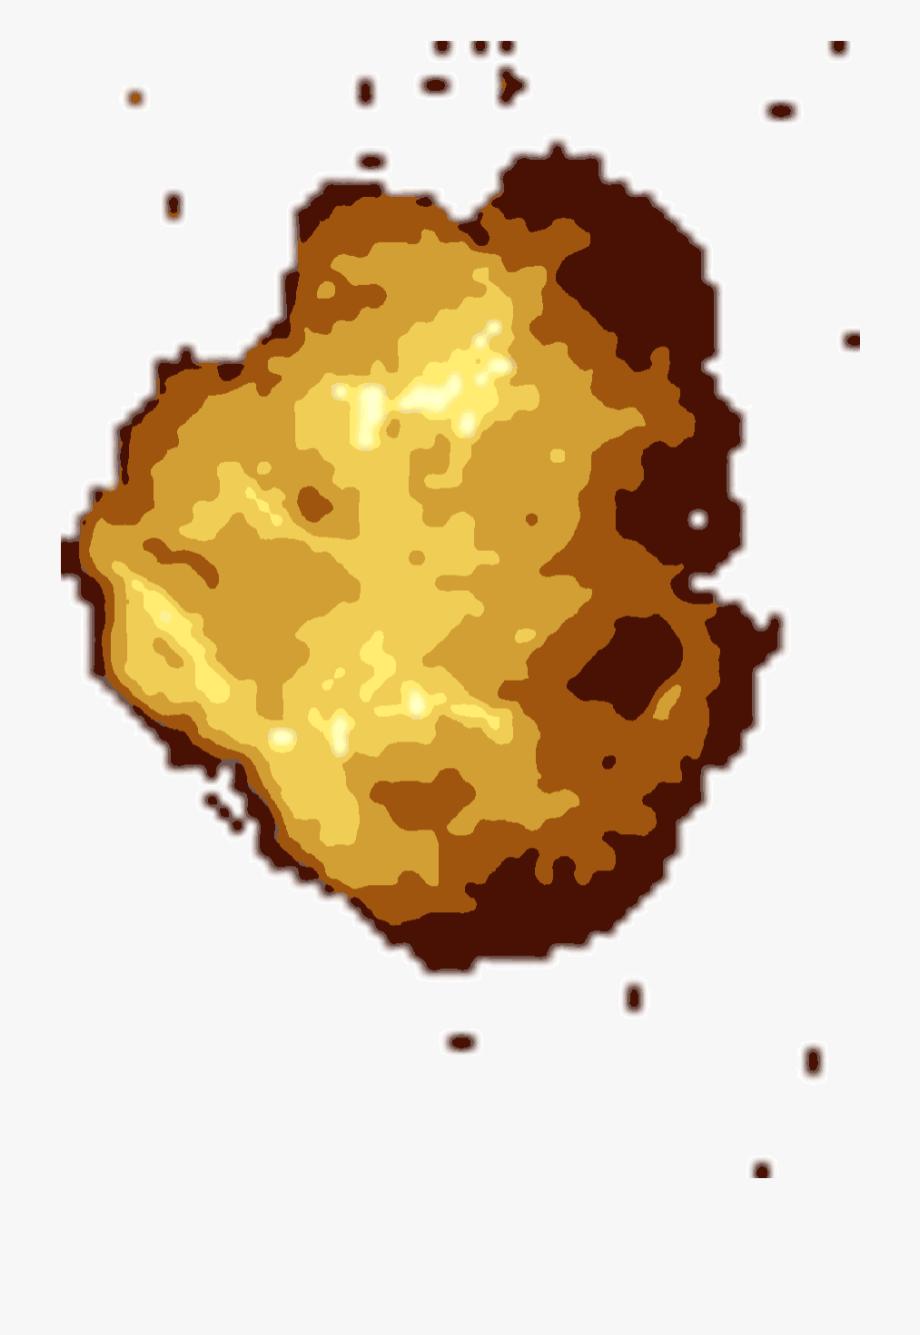 Gif Explosion Animation Image Giphy.